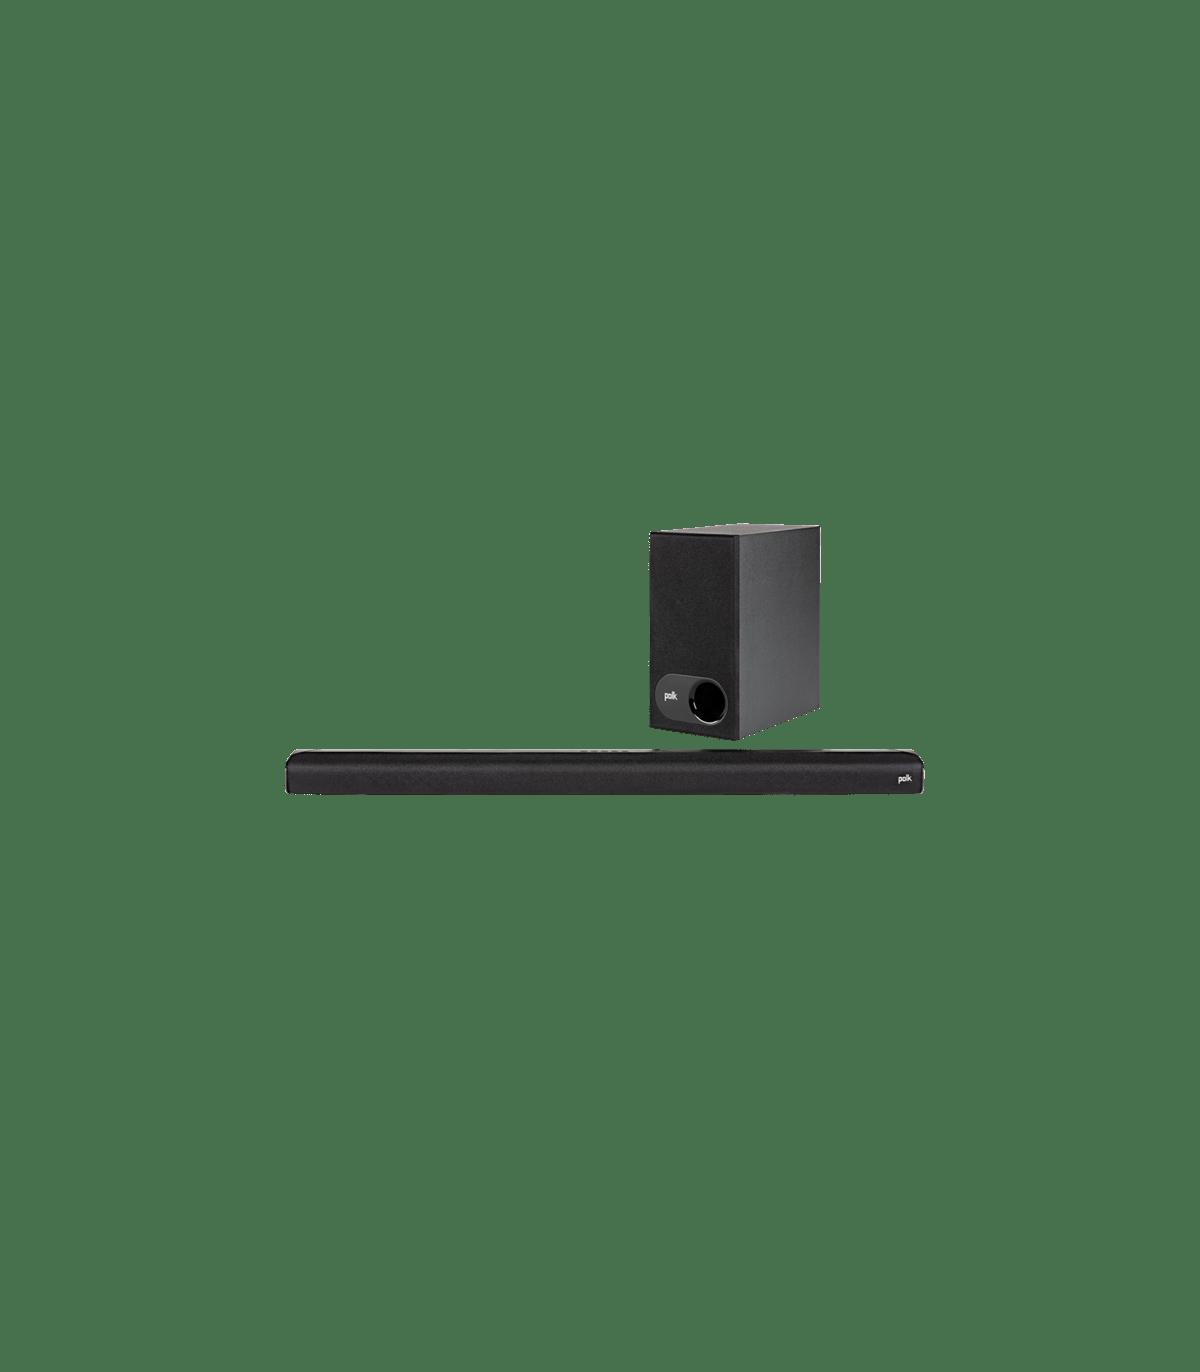 polk audio signas2 meuble tv universel